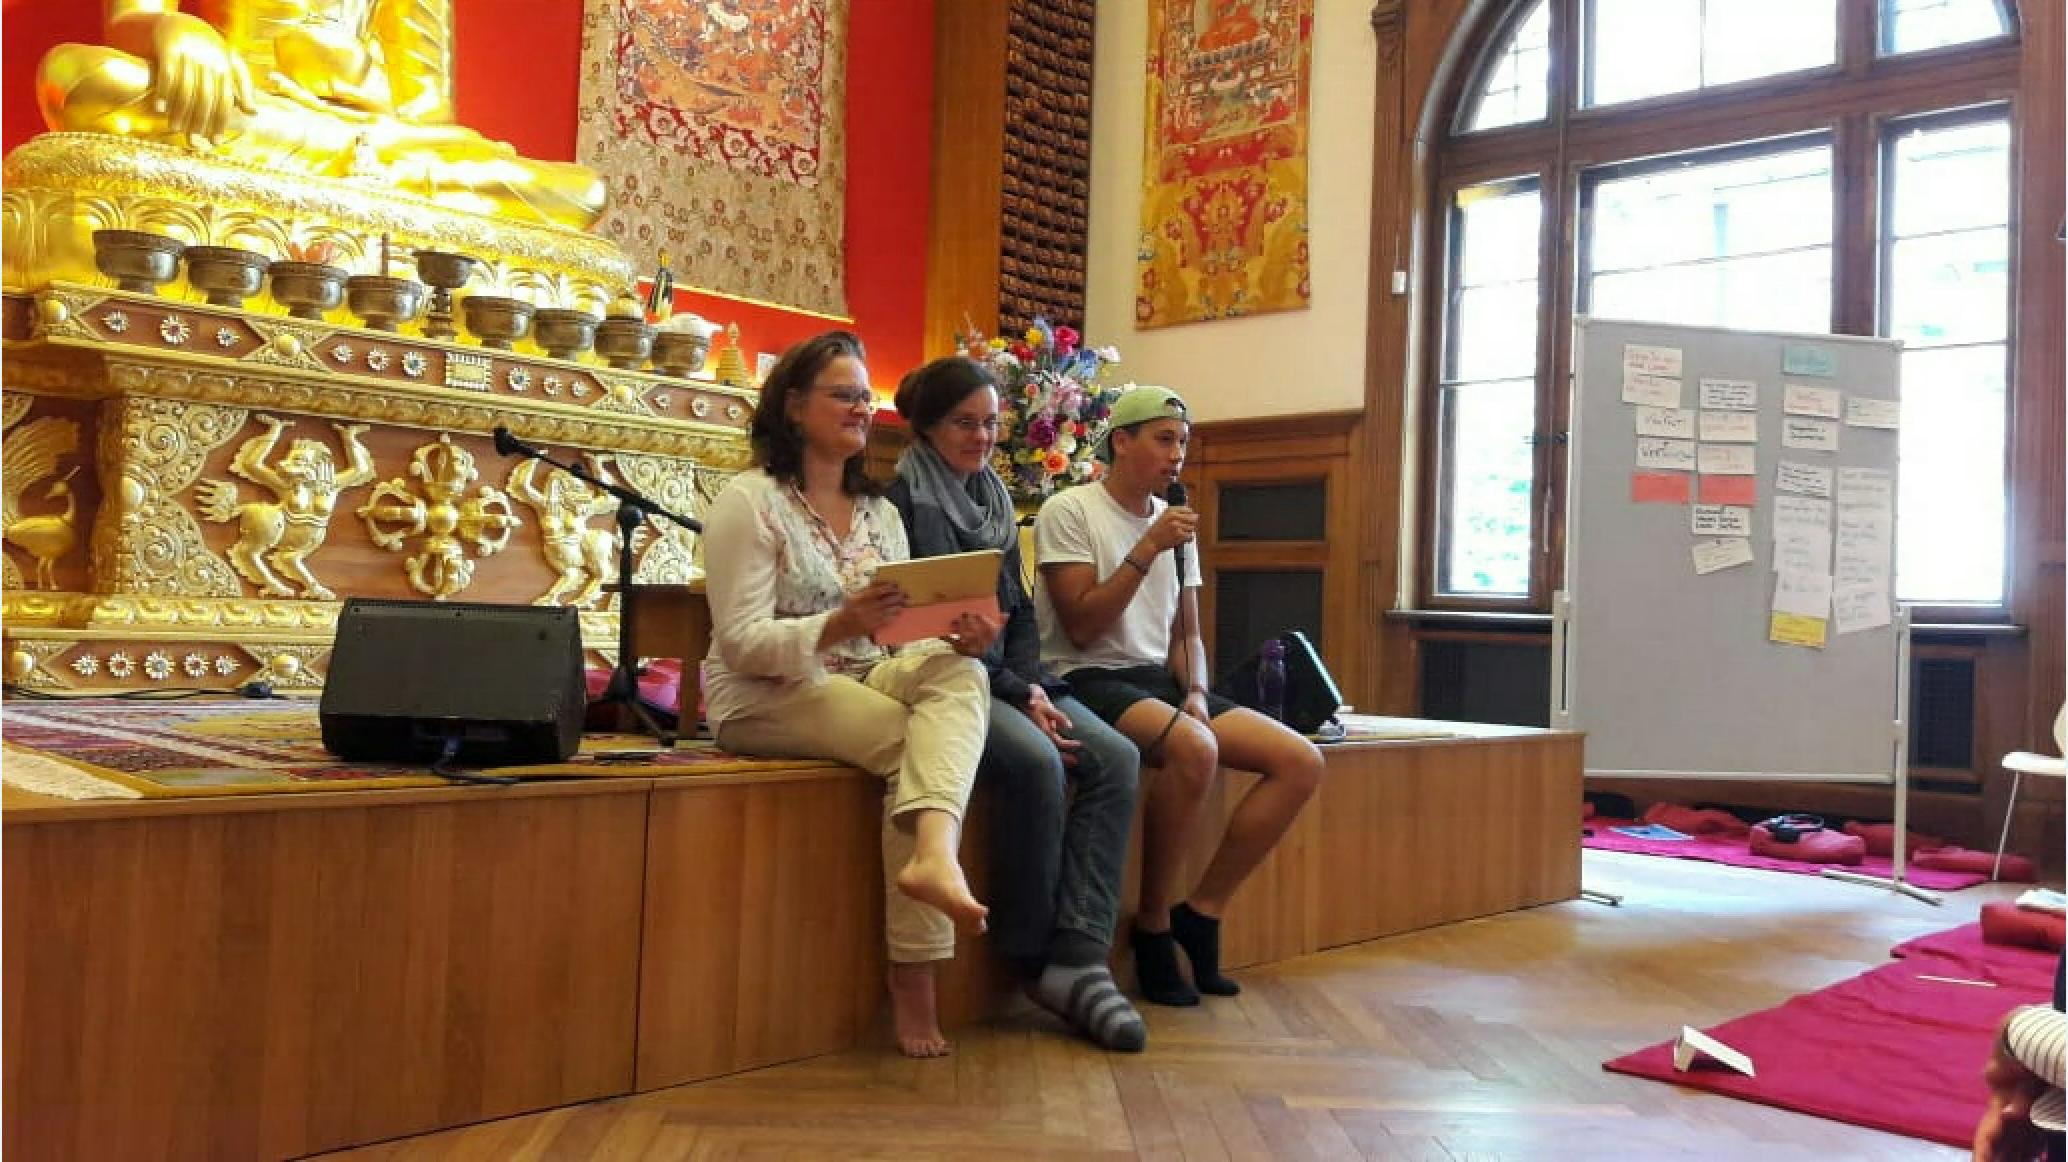 Sangha Sitzung, Sieben Punkte des Geistestraining, Dharma Mati Berlin (Mai 2018)